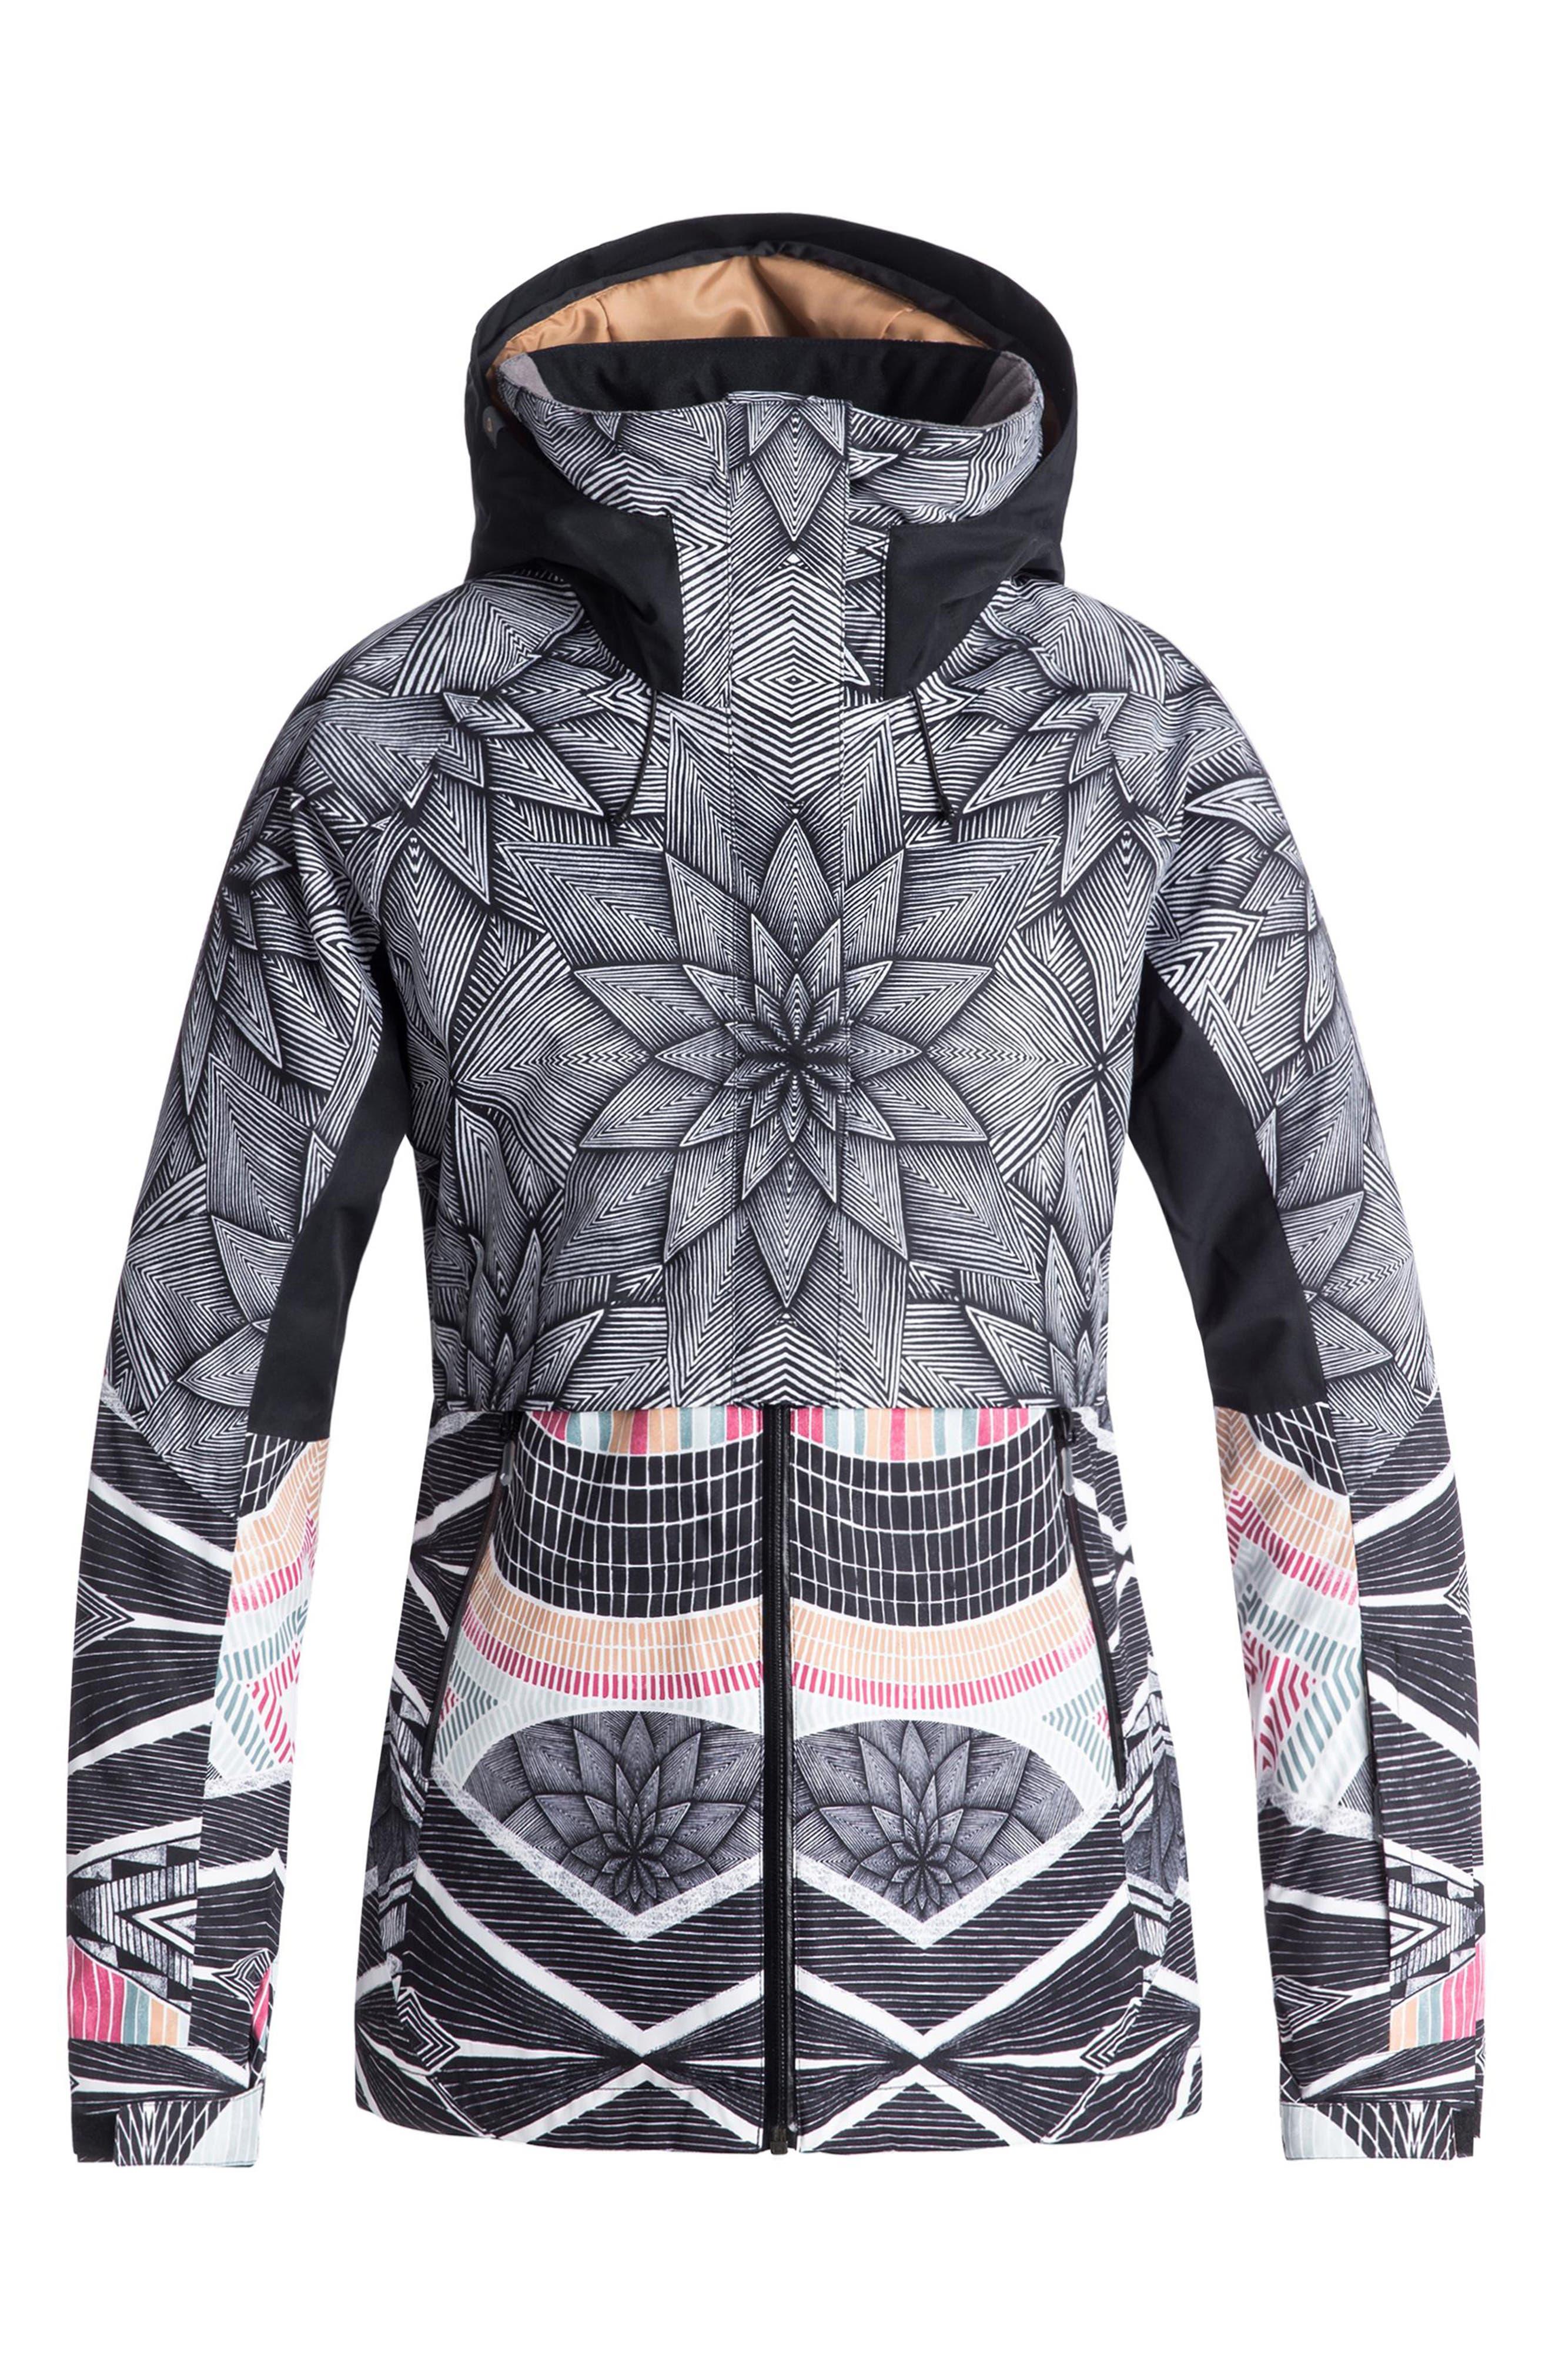 Frozen Flow Hooded Ski Jacket,                             Main thumbnail 1, color,                             TRUE BLACK/ POP SNOW STARS